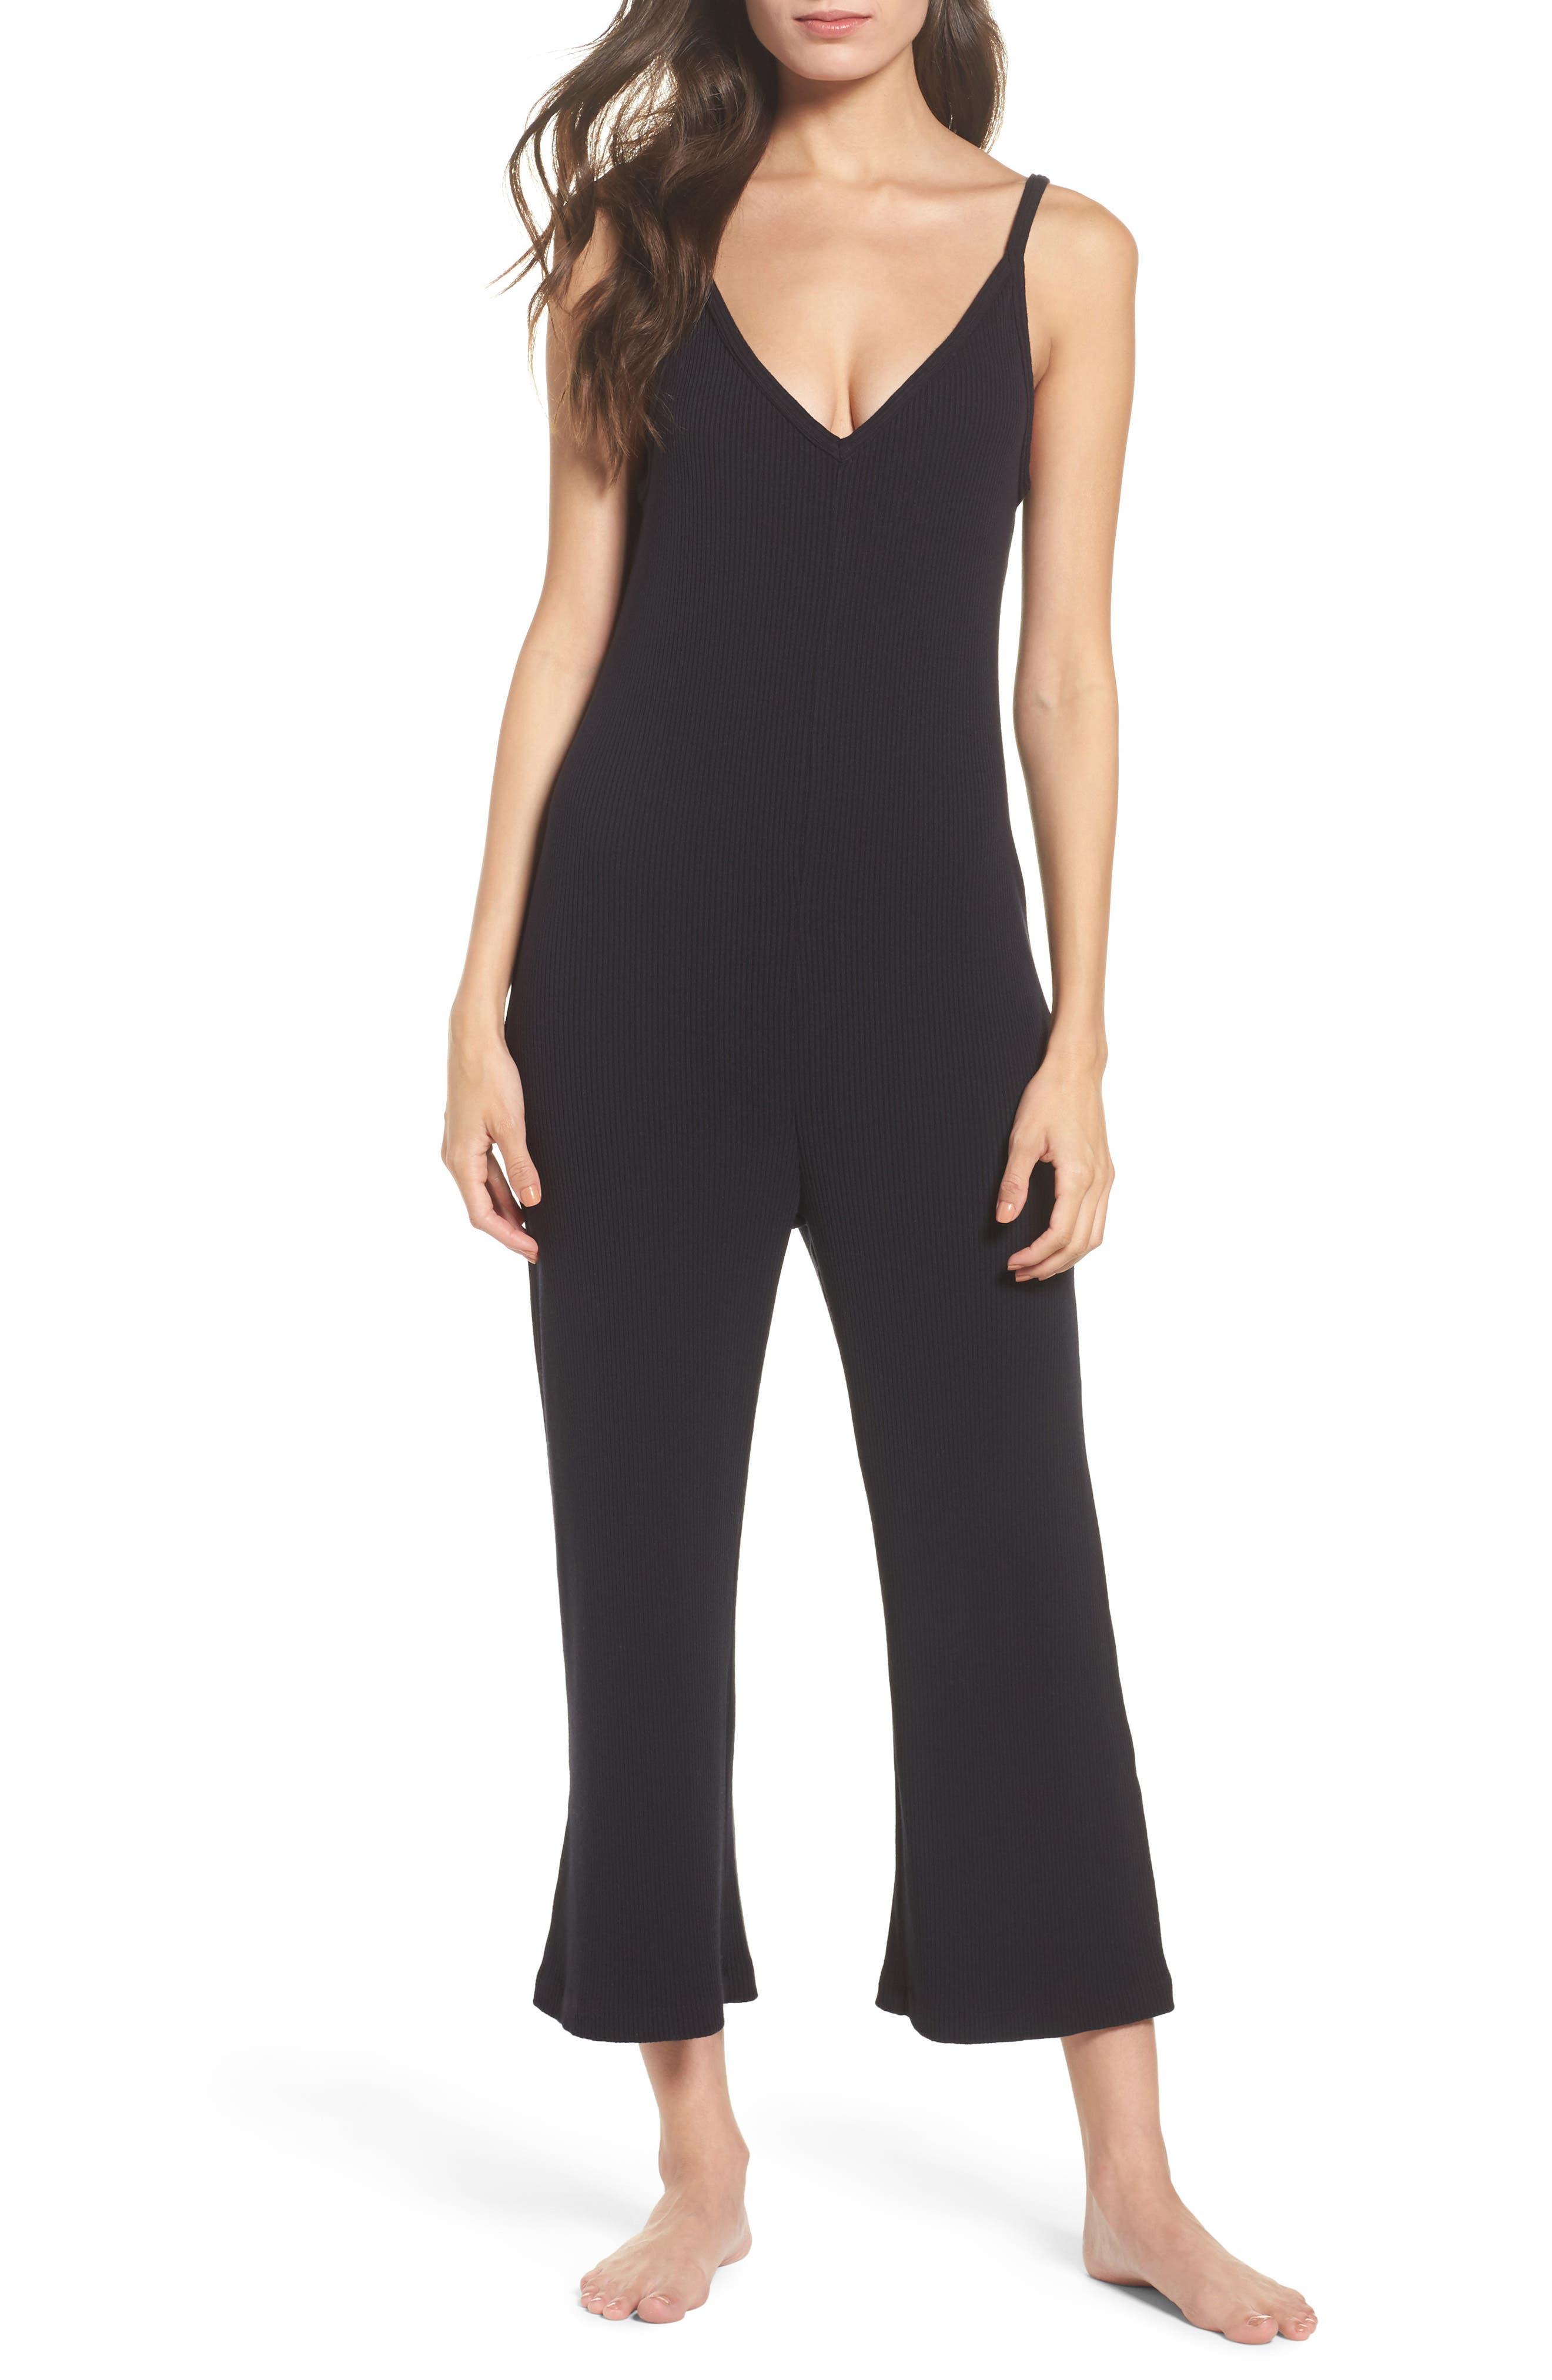 Main Image - LACAUSA Naomi Knit Lounge Jumpsuit